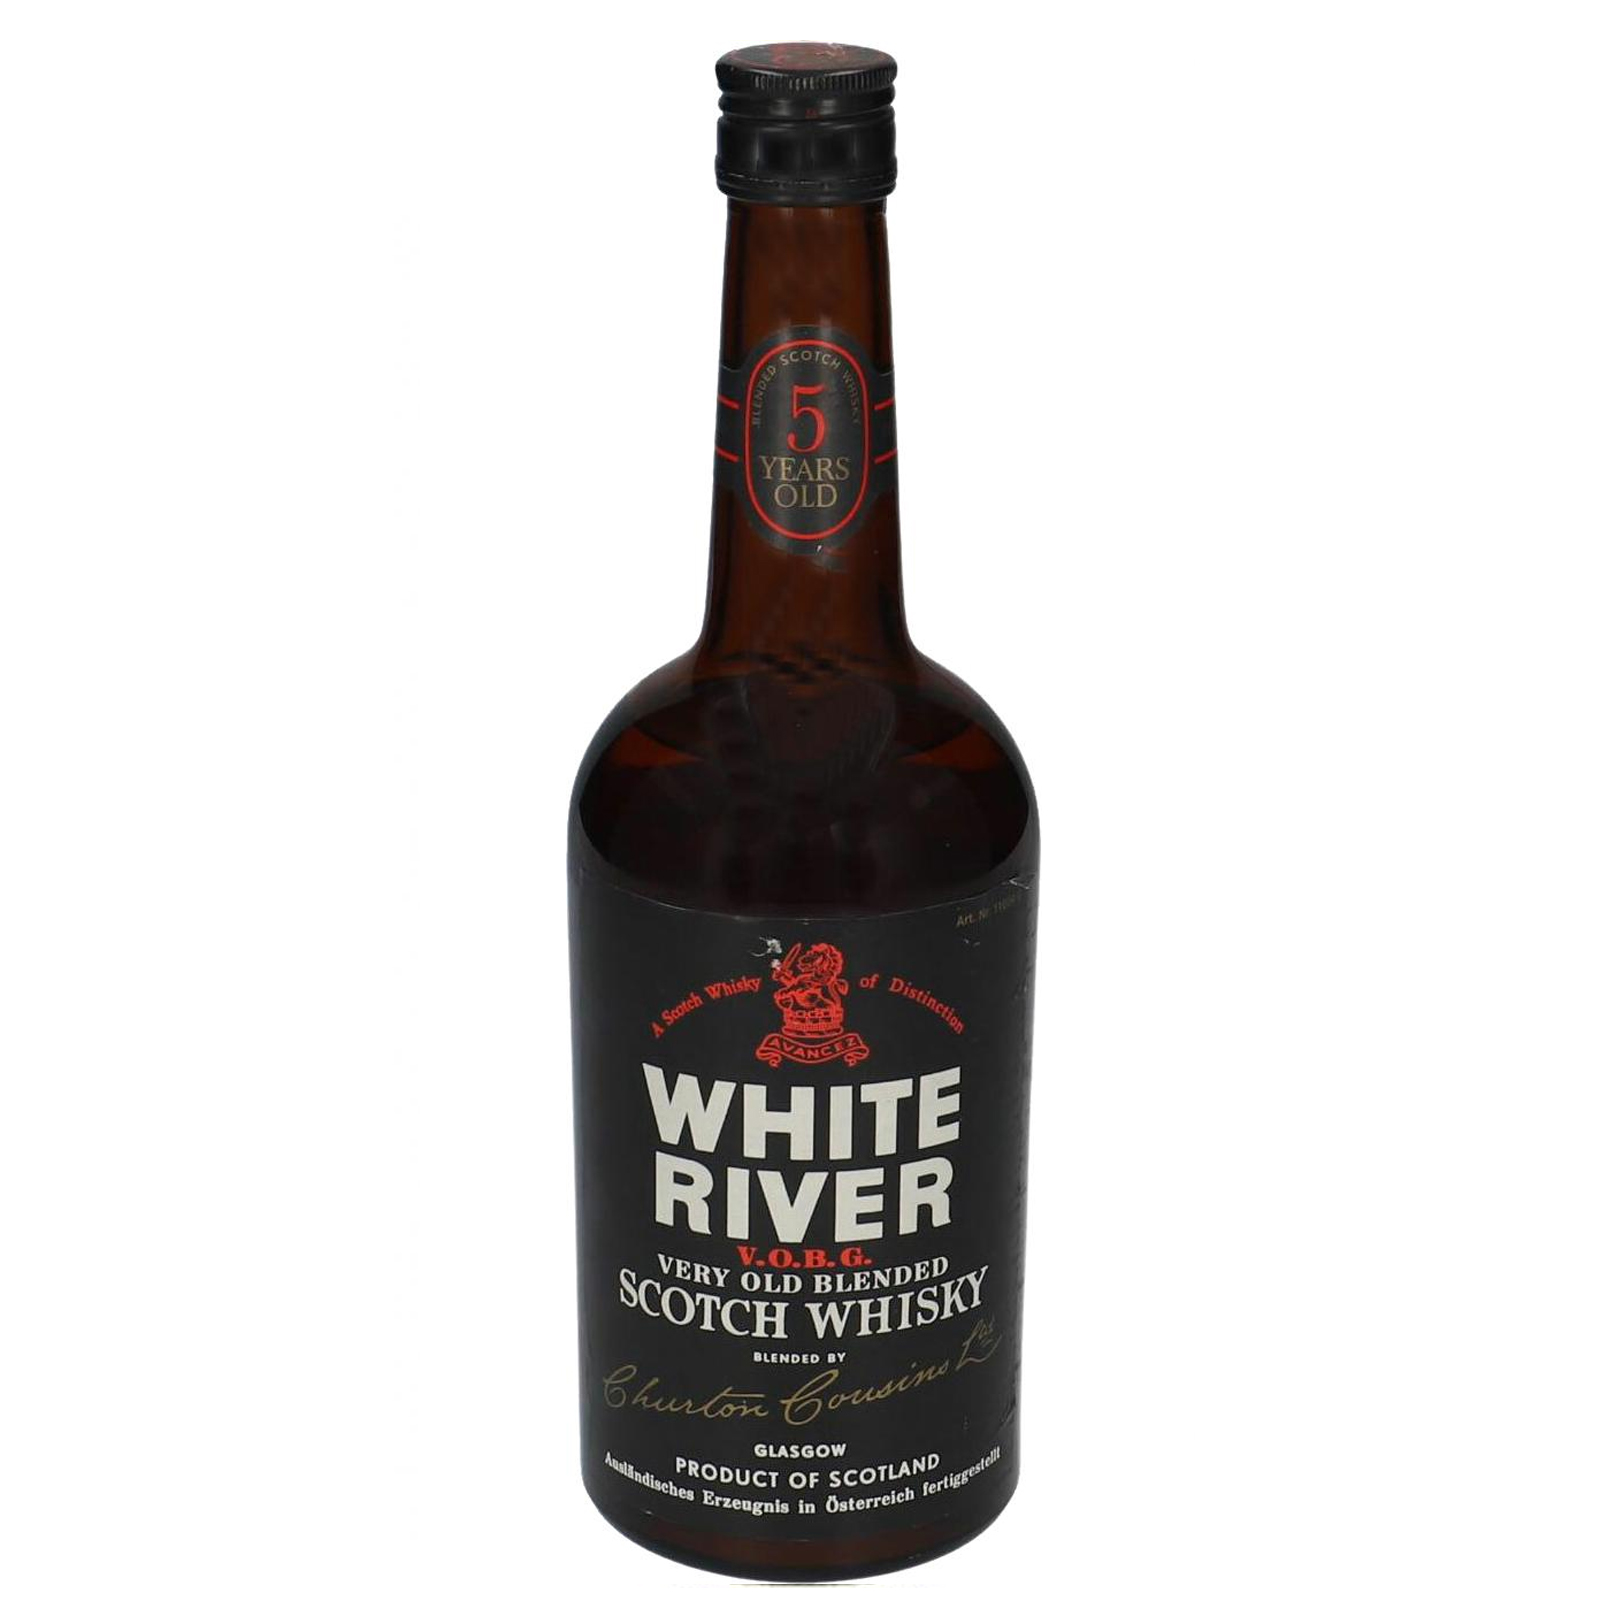 White River – 5 years